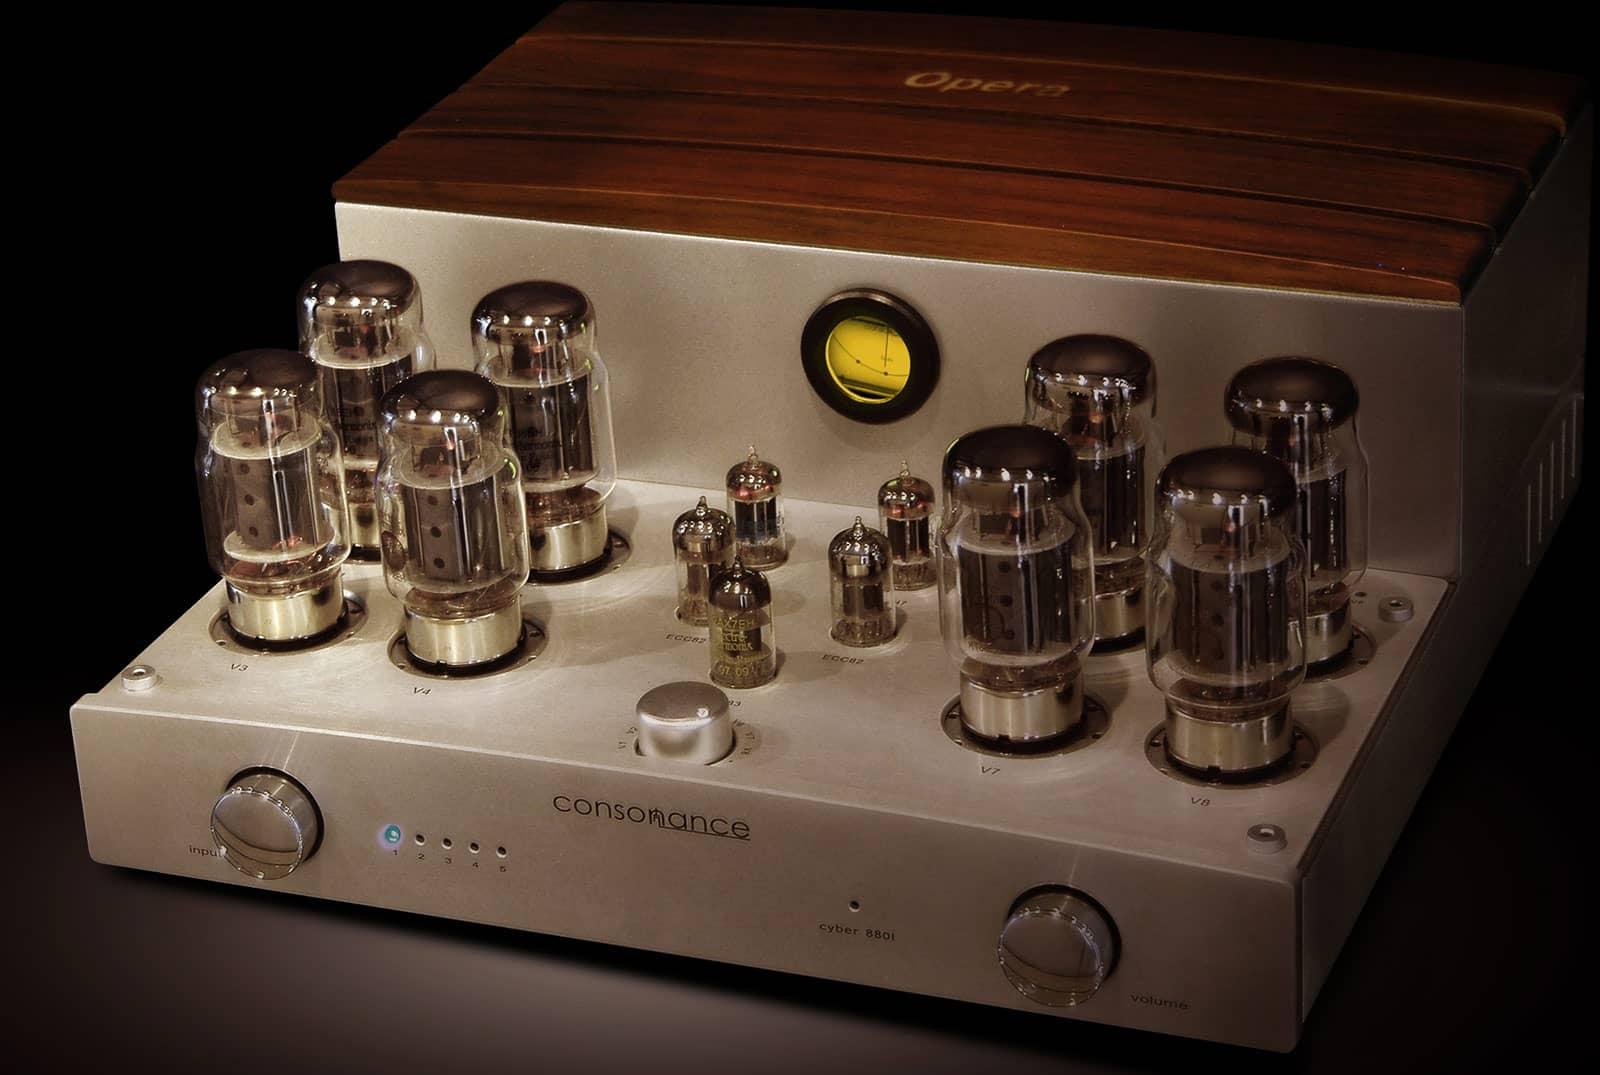 Buy tube amplifier from Opera Consonance online